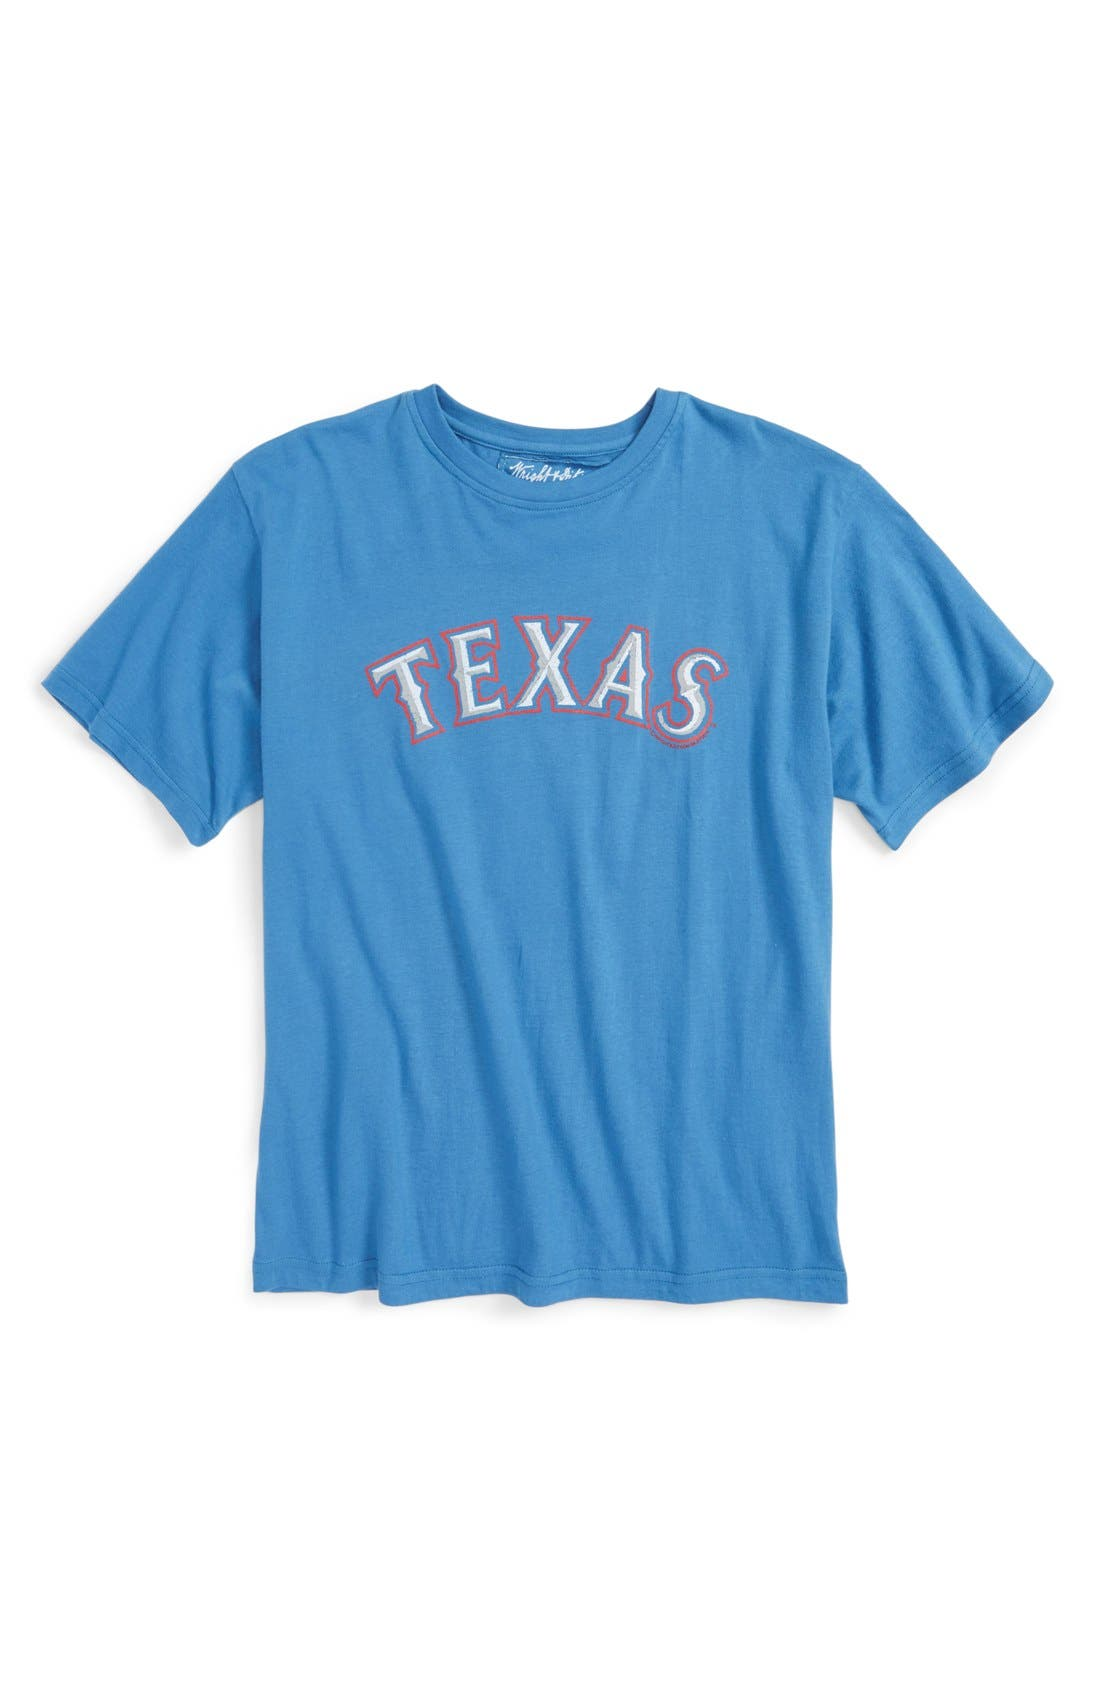 Alternate Image 1 Selected - Wright & Ditson 'Texas Rangers' T-Shirt (Little Boys & Big Boys)